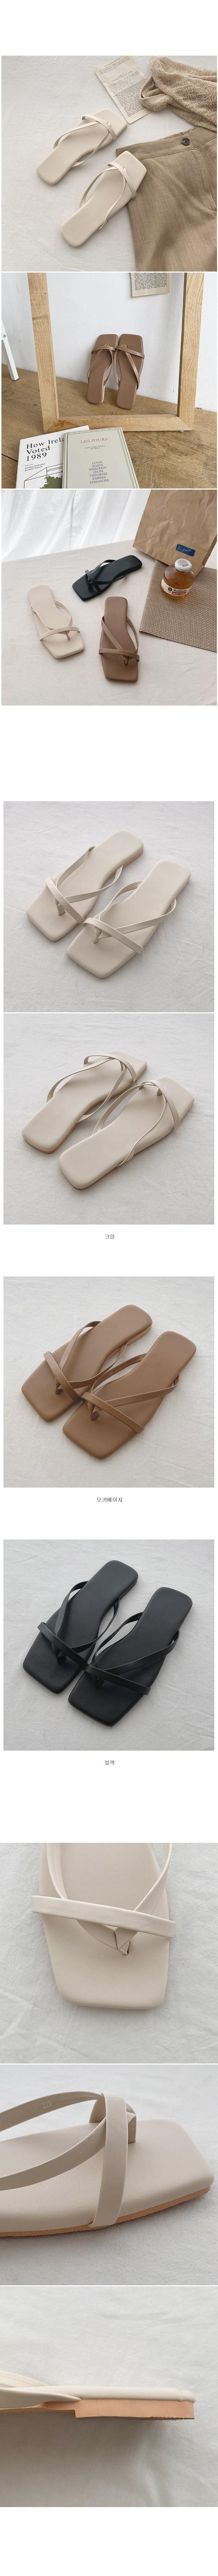 On the slipper sandals